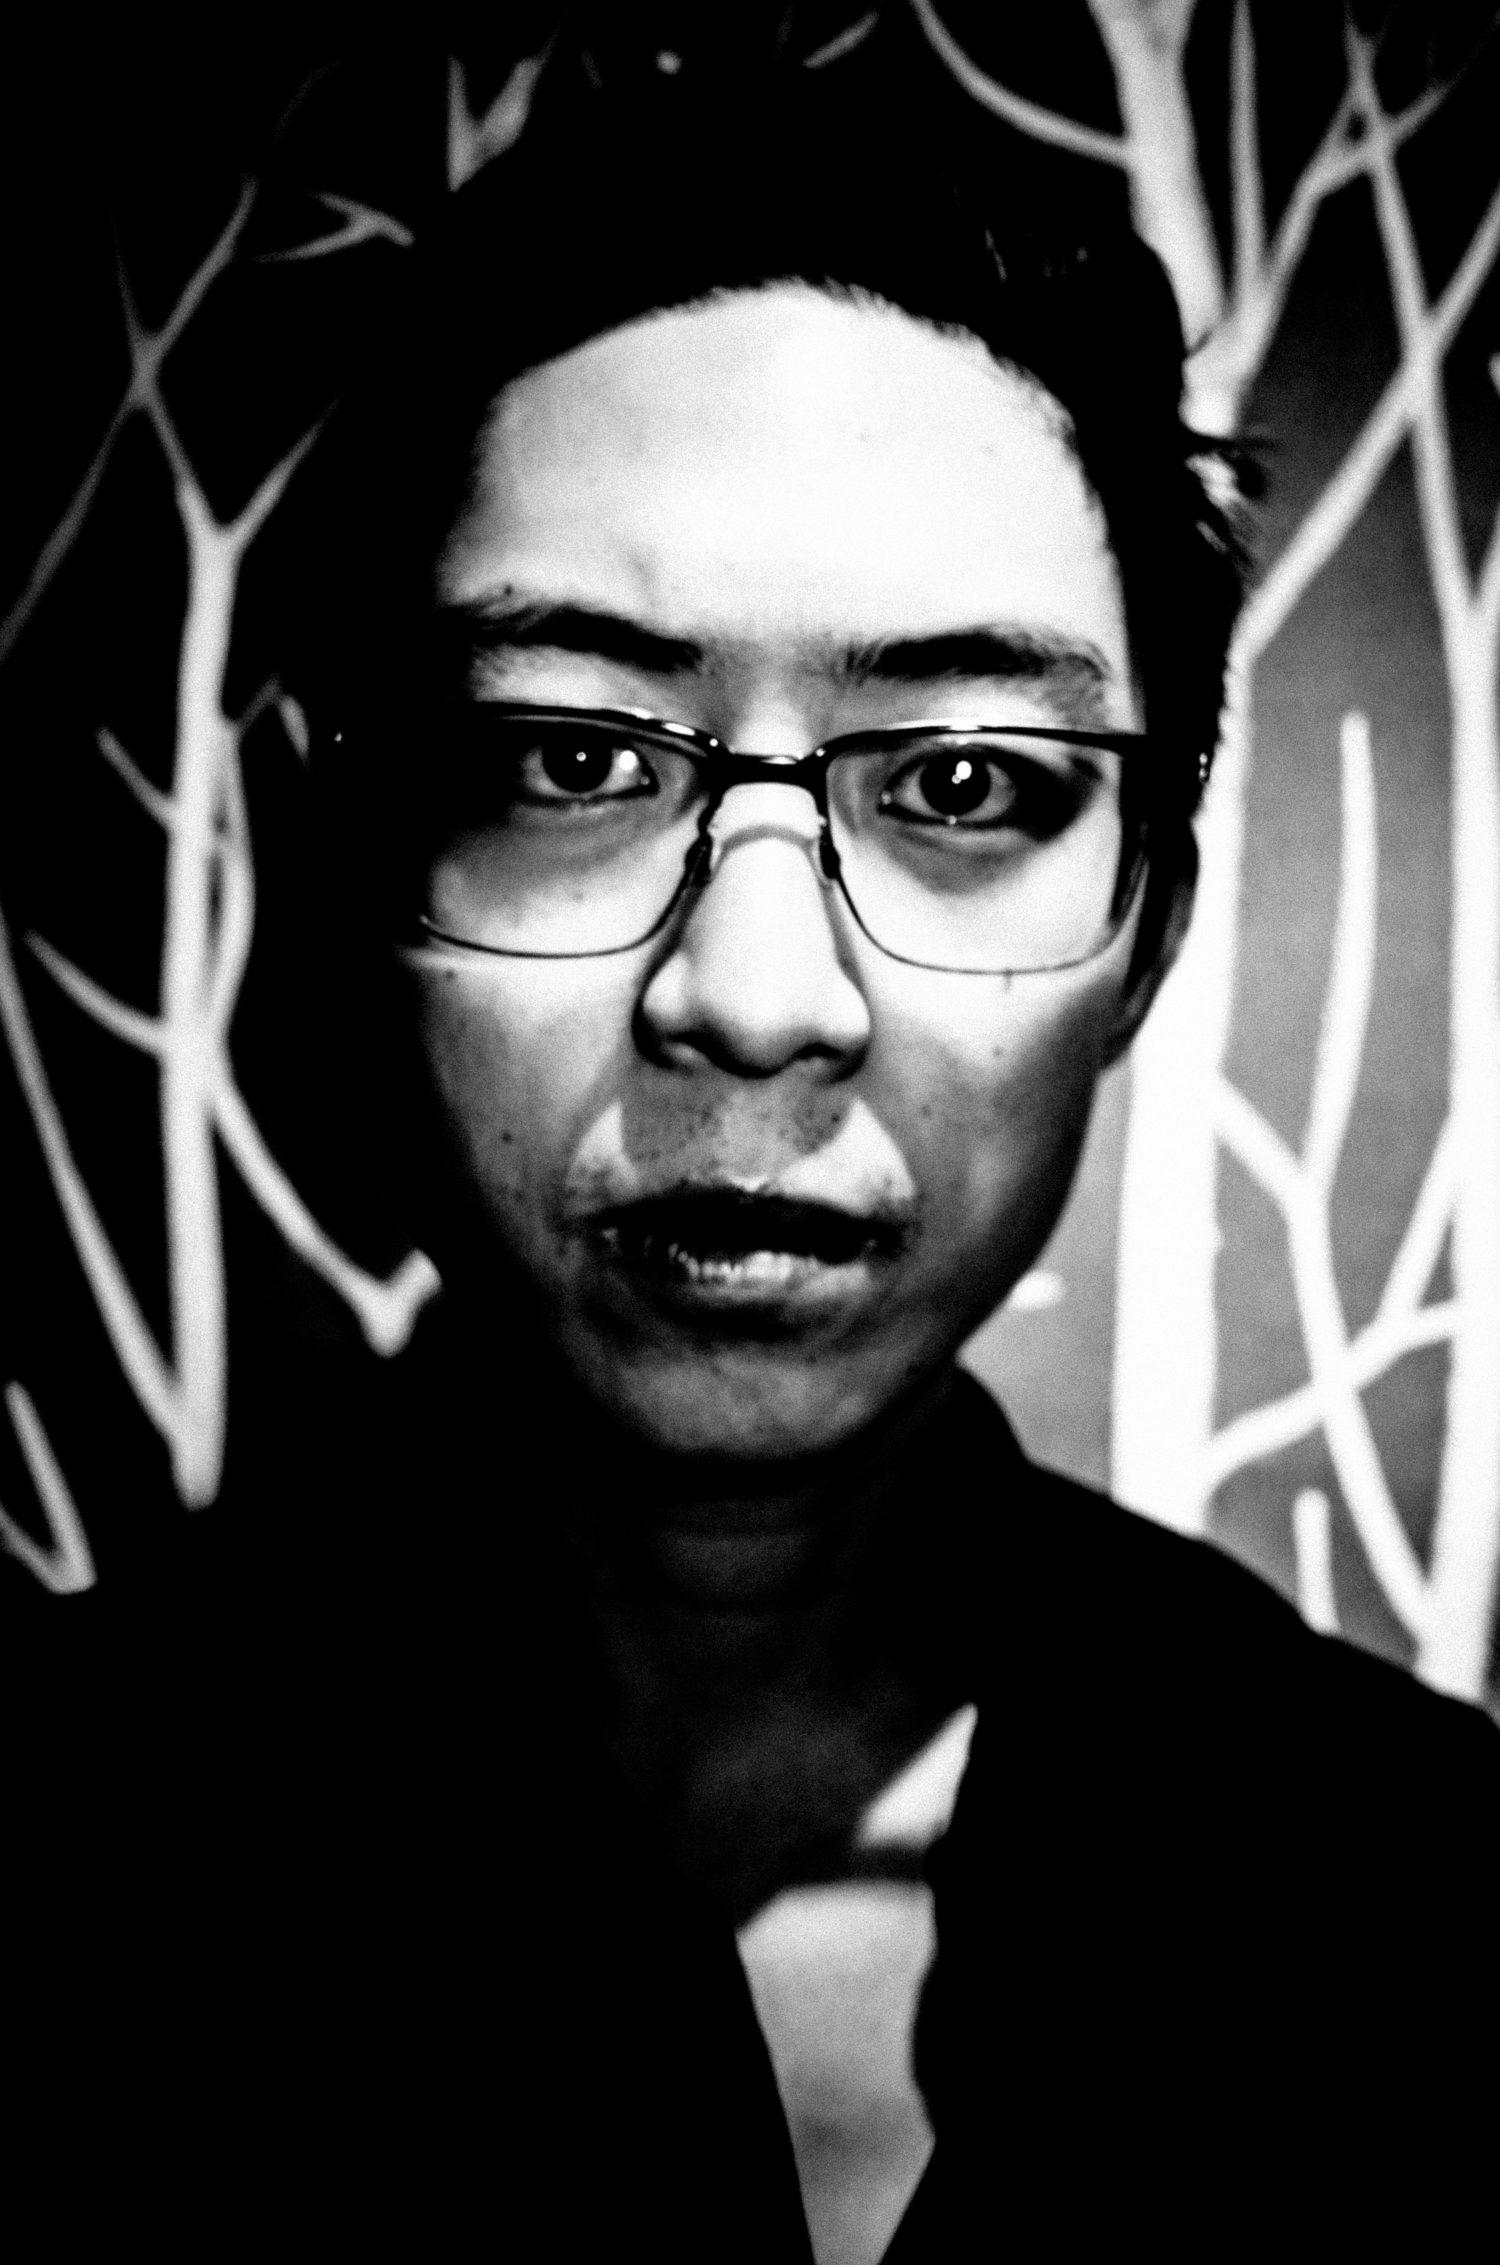 Self-Portrait In Black And White PDF Free Download